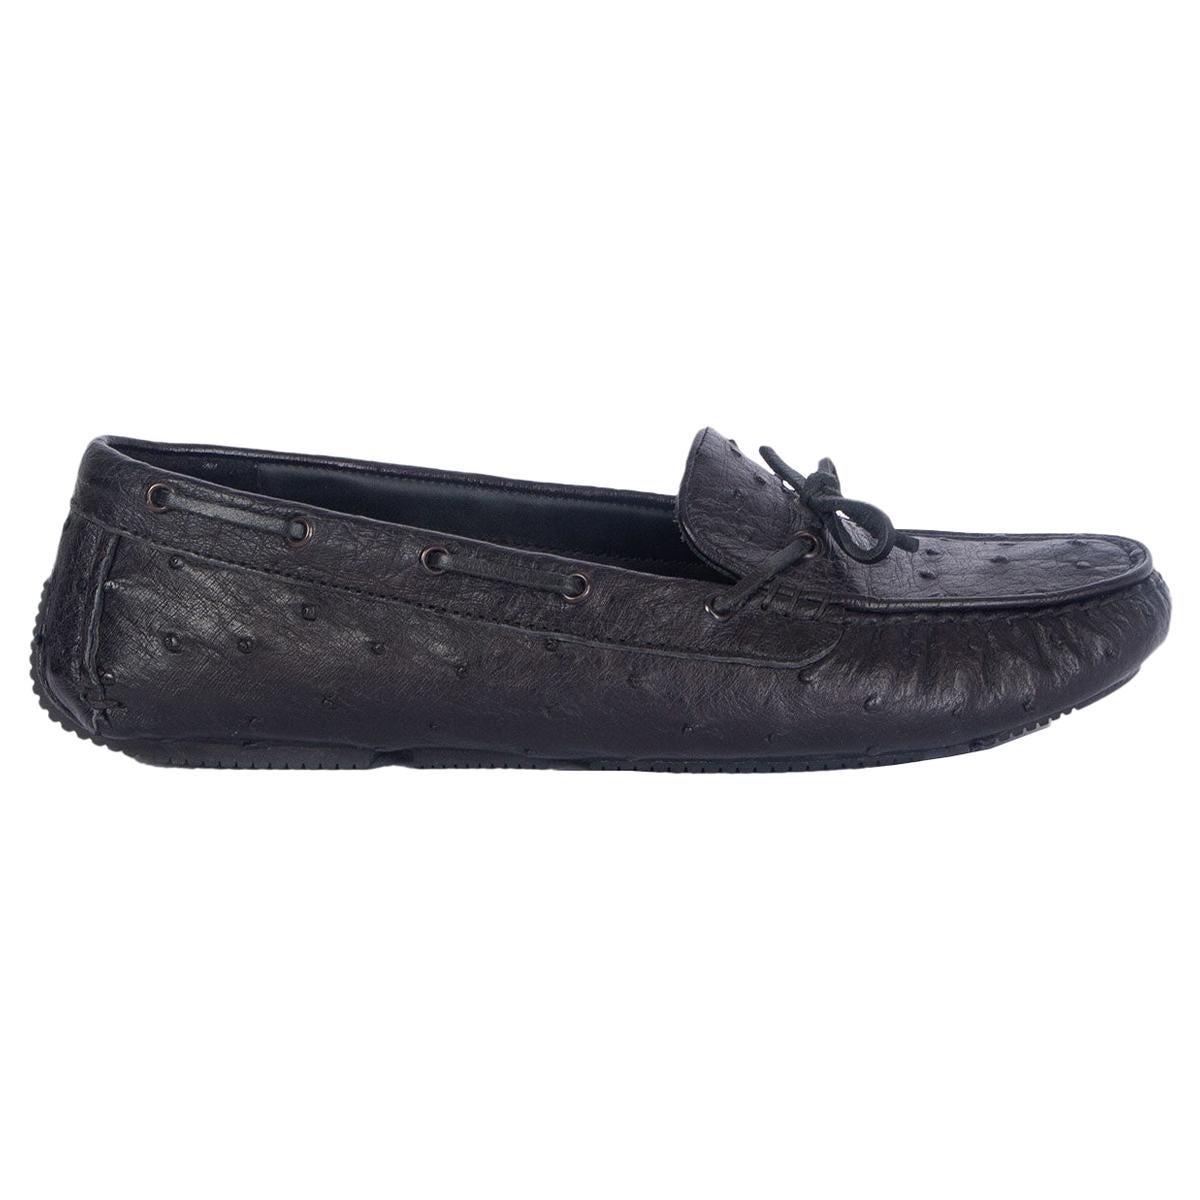 auth BOTTEGA VENETA black OSTRICH Loafers Flats Shoes 38